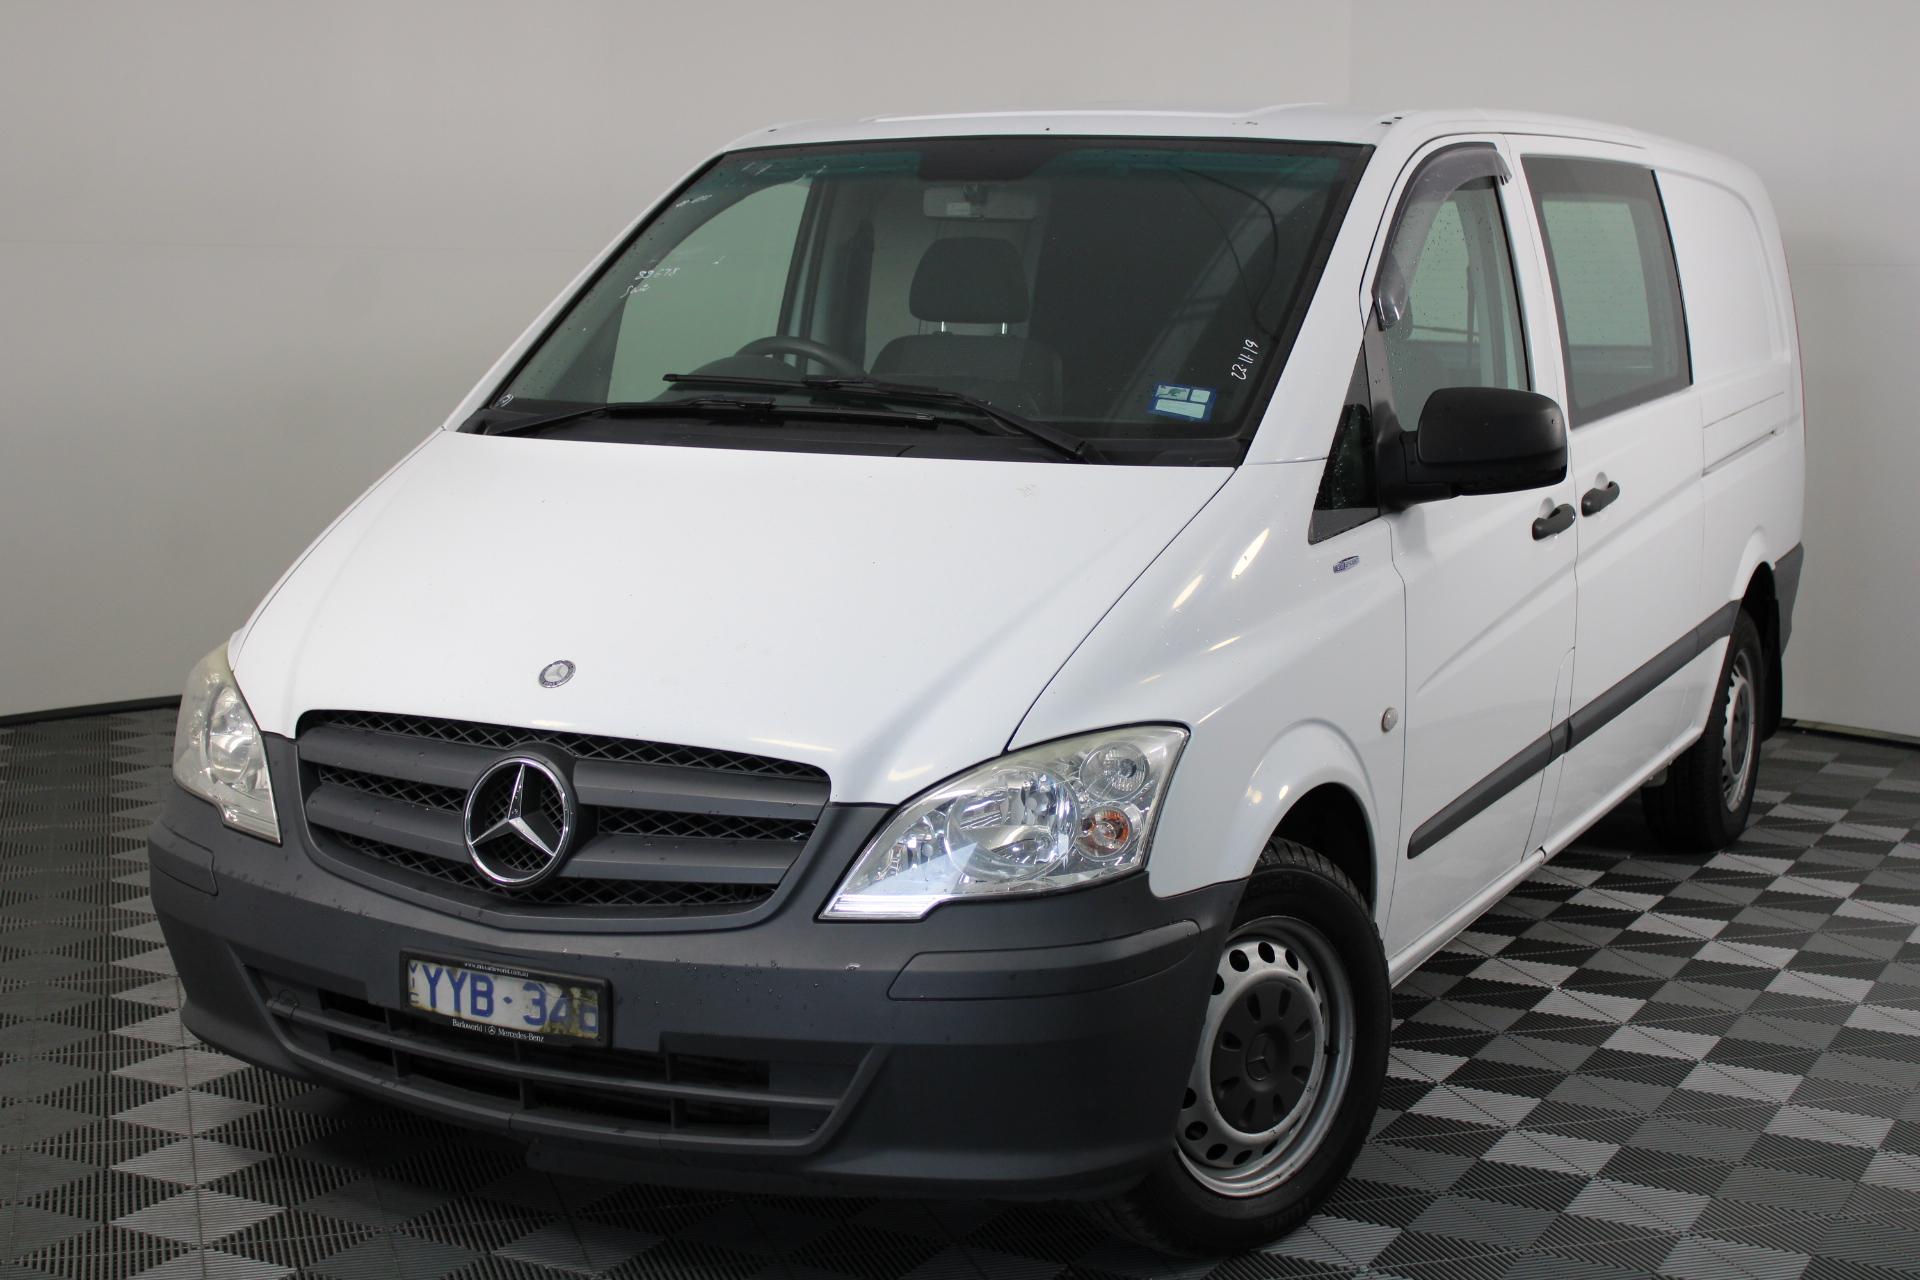 2011 Mercedes Benz Vito 113CDI LWB Turbo Diesel Automatic Van